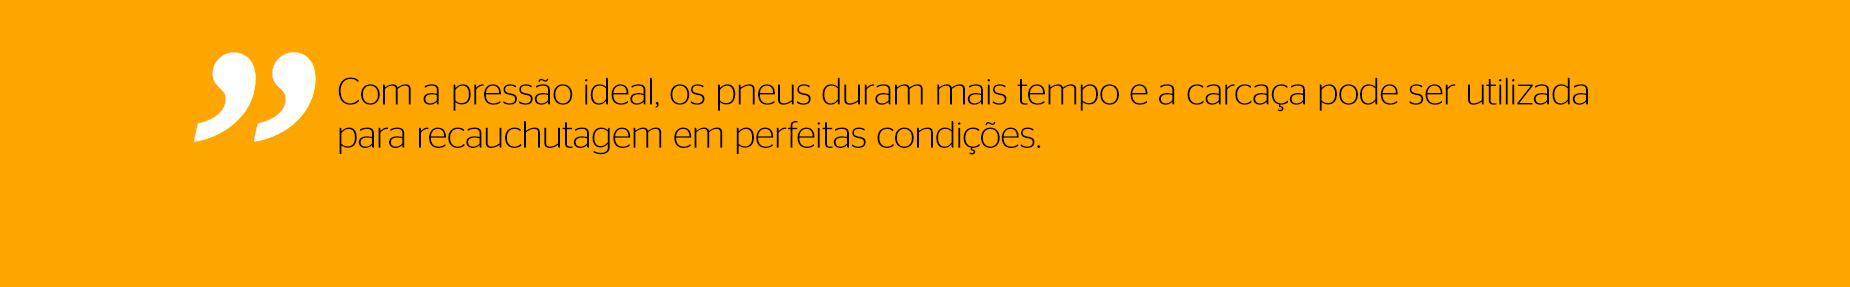 portugal-quote